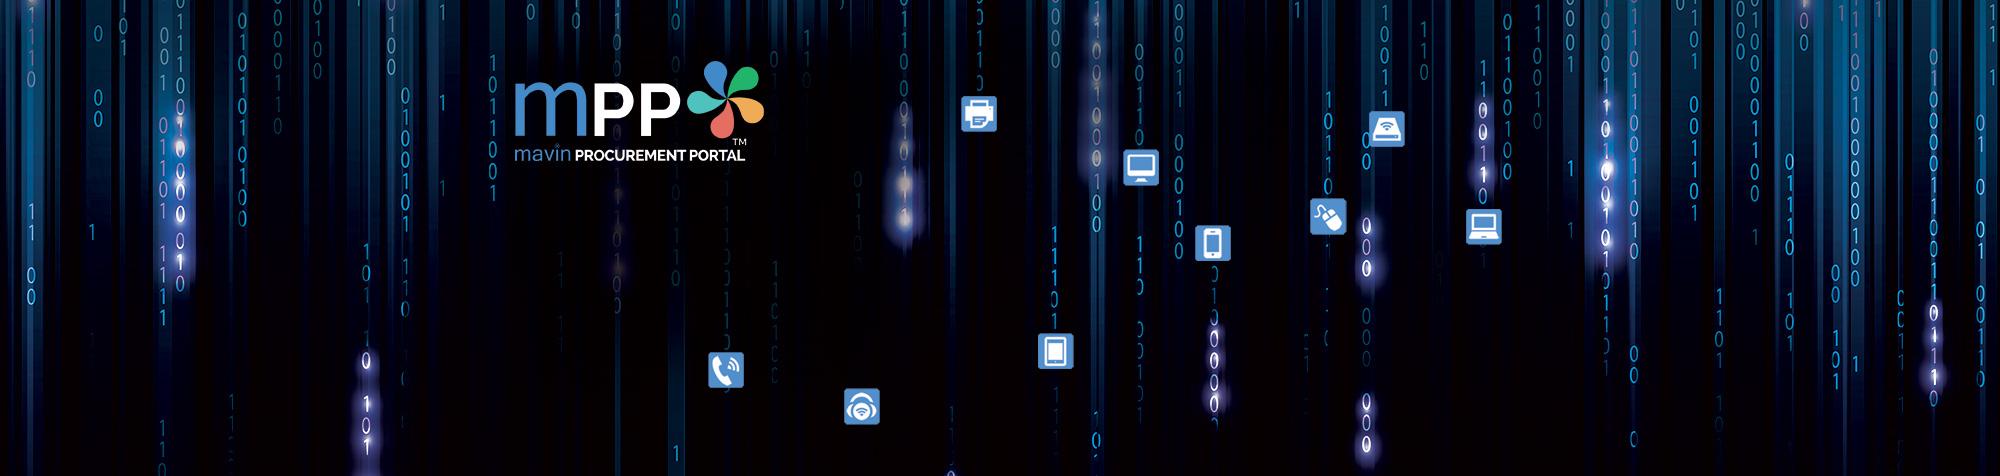 Mavin procurement Portal